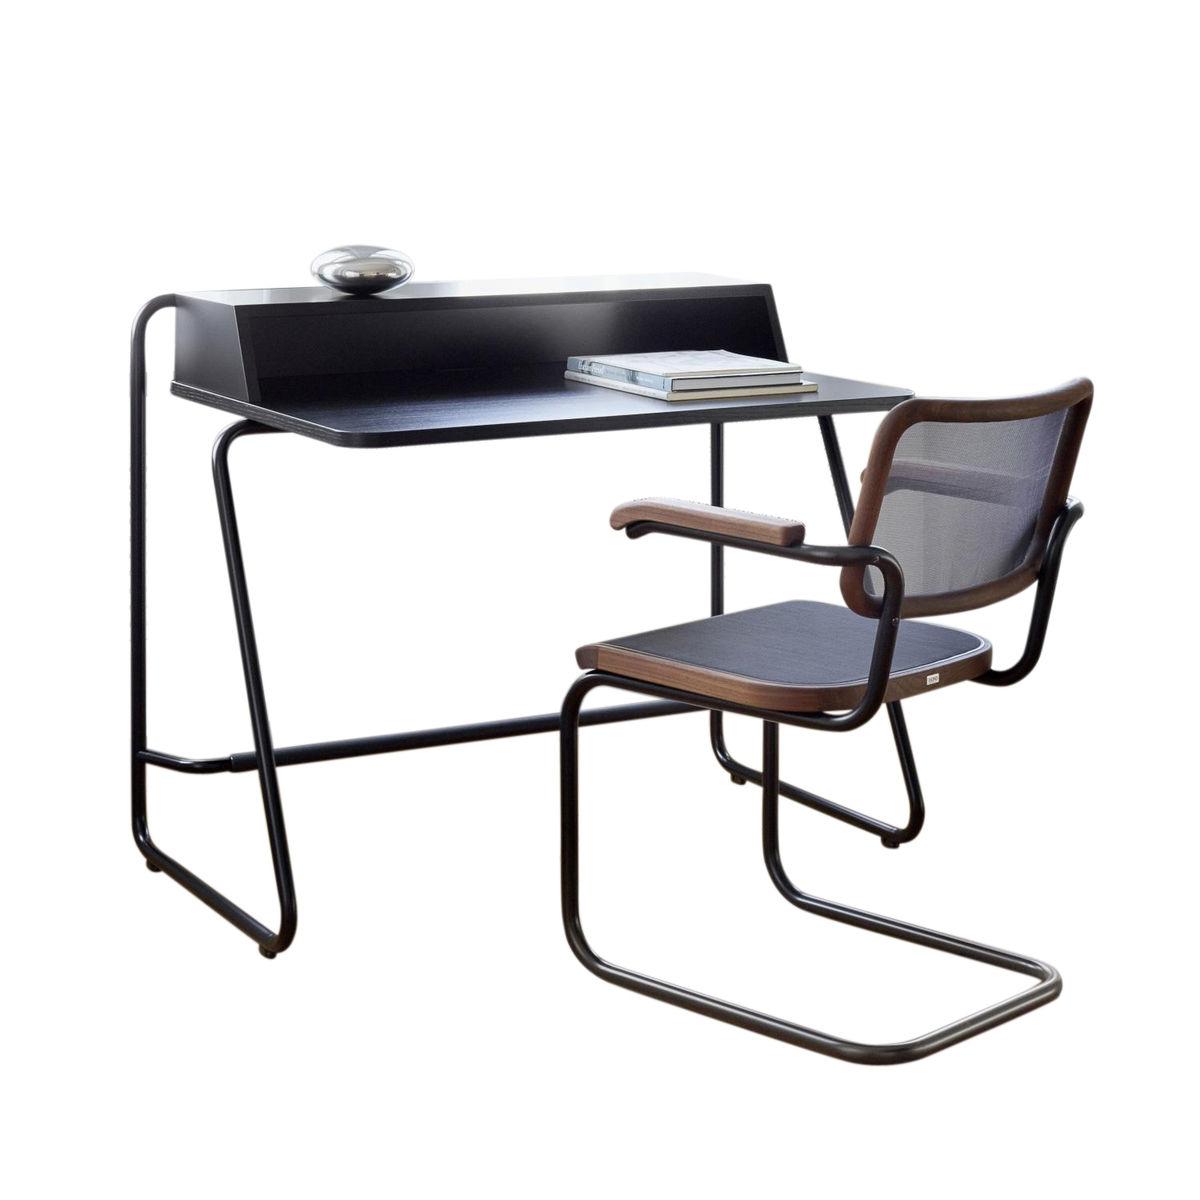 s 1200 desk home desk classics in colour thonet. Black Bedroom Furniture Sets. Home Design Ideas